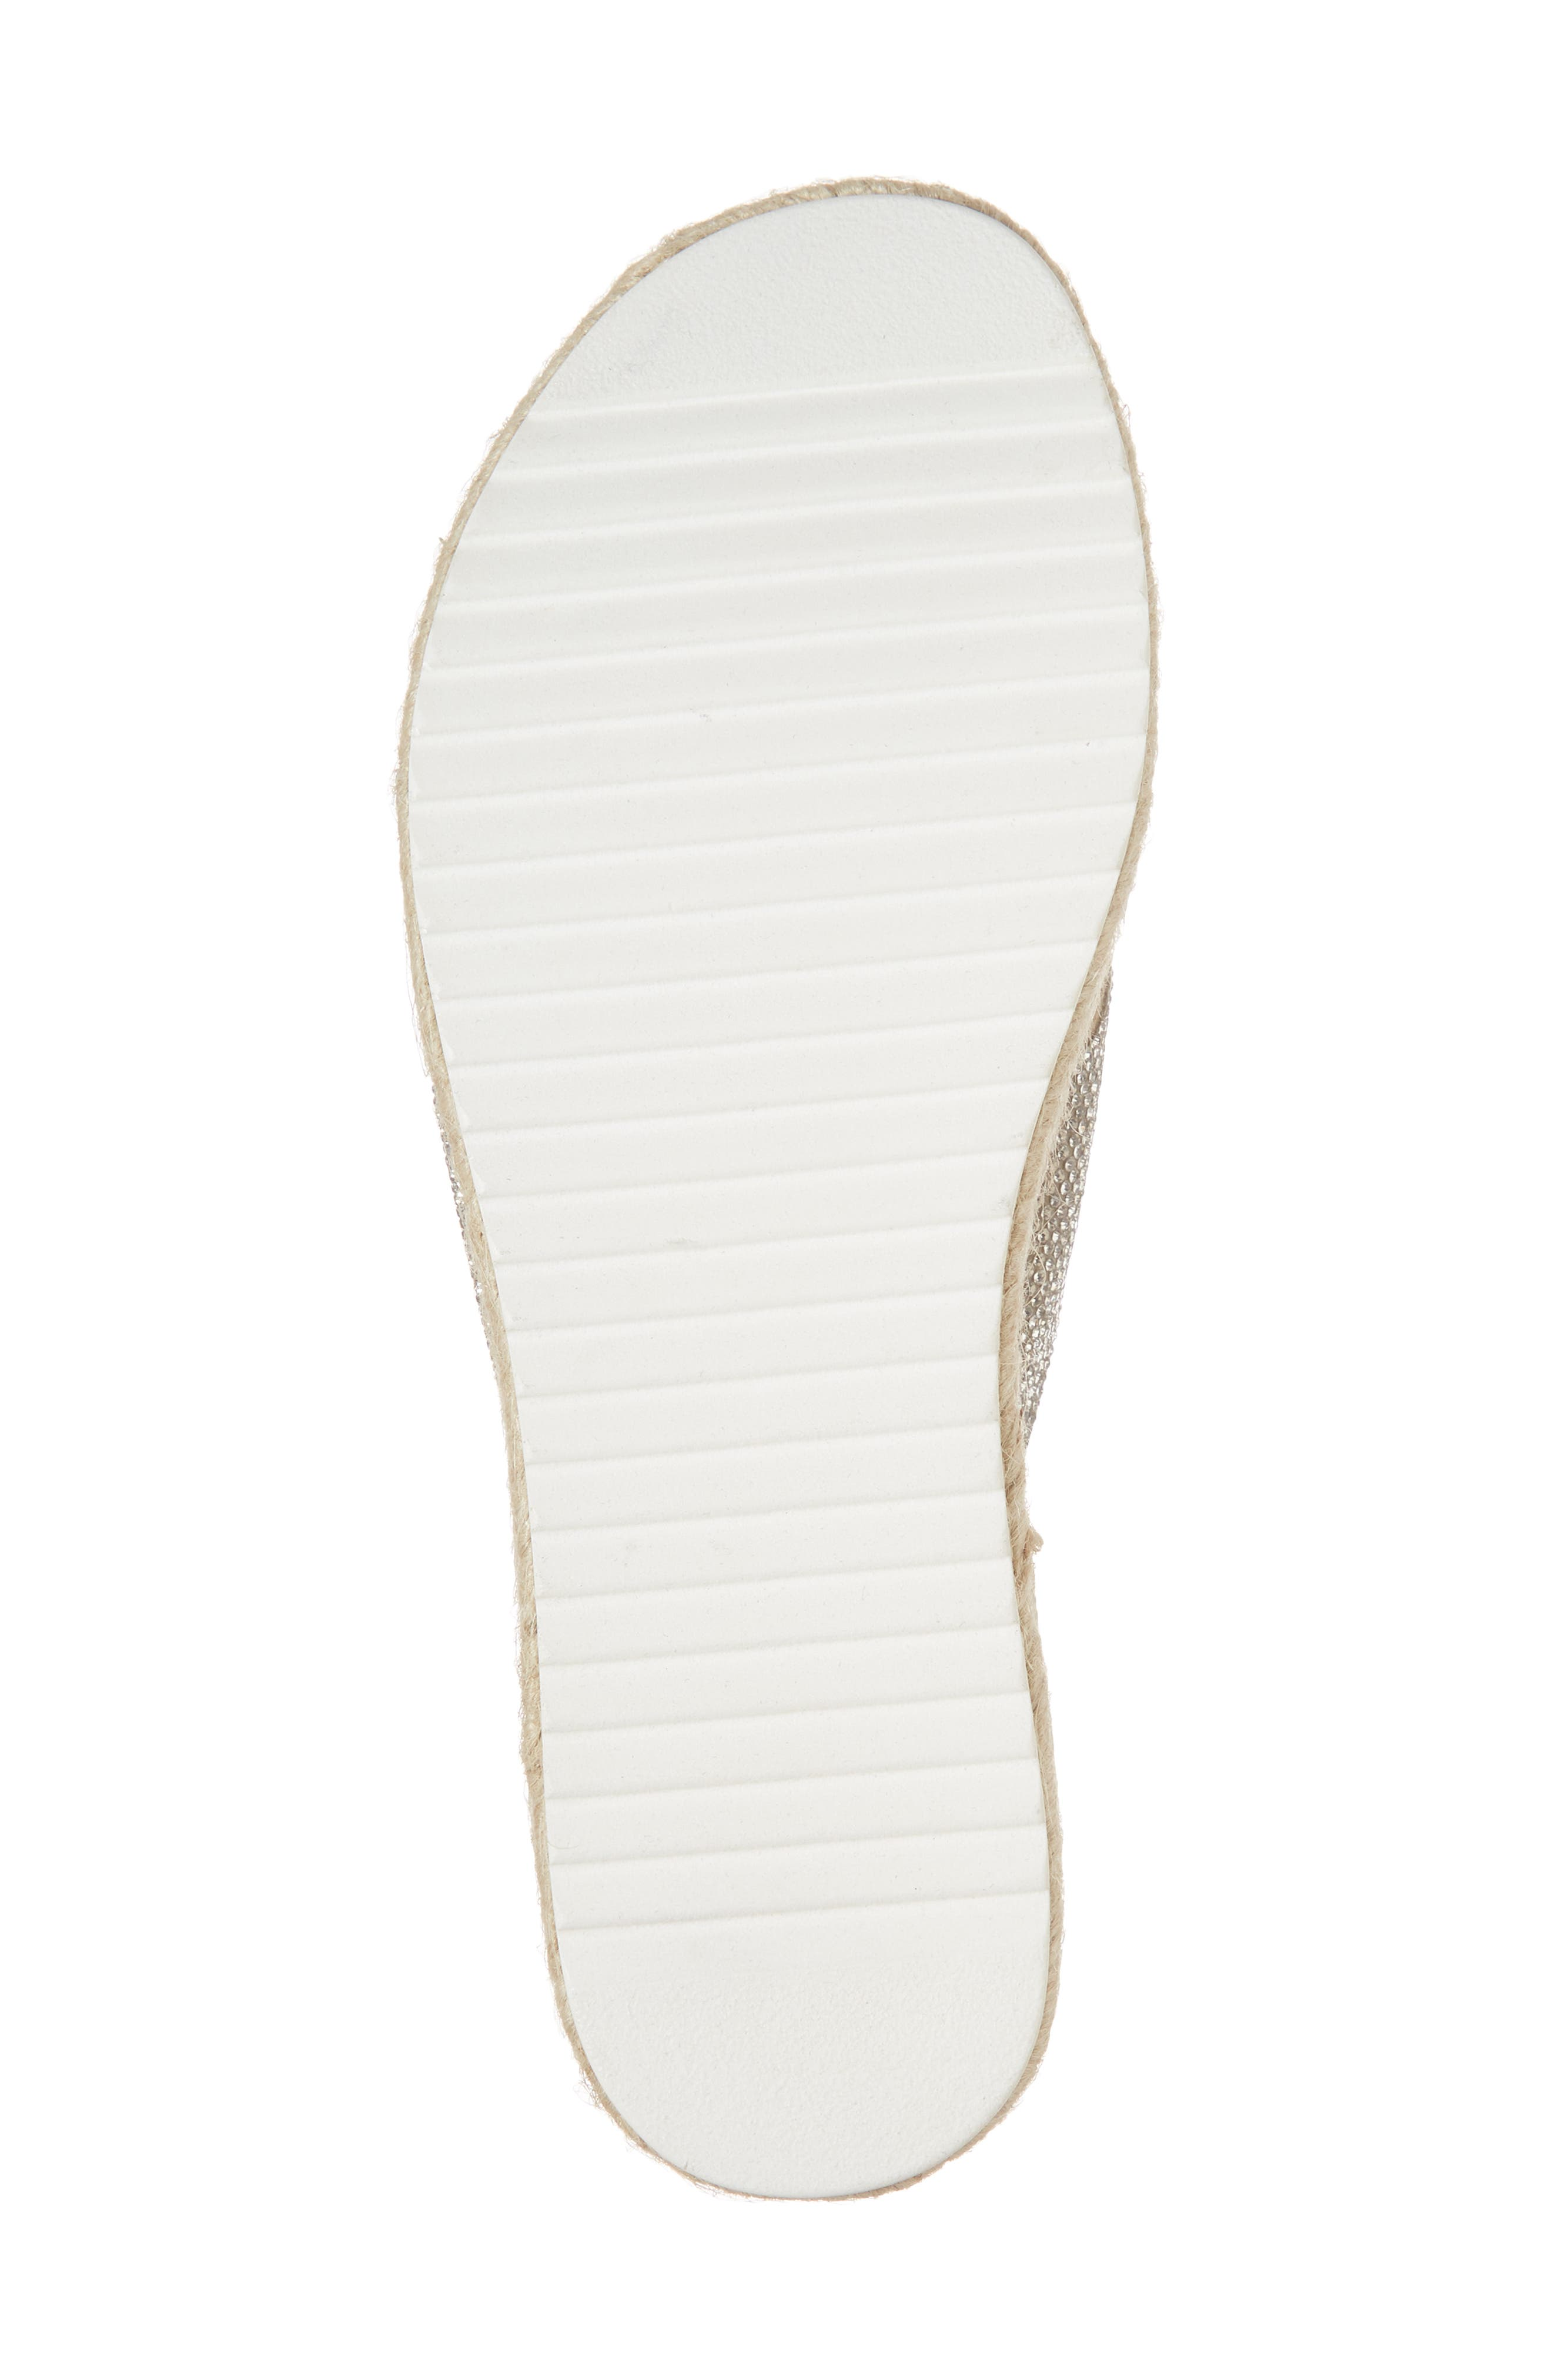 Arran-R Platform Espadrille Sandal,                             Alternate thumbnail 12, color,